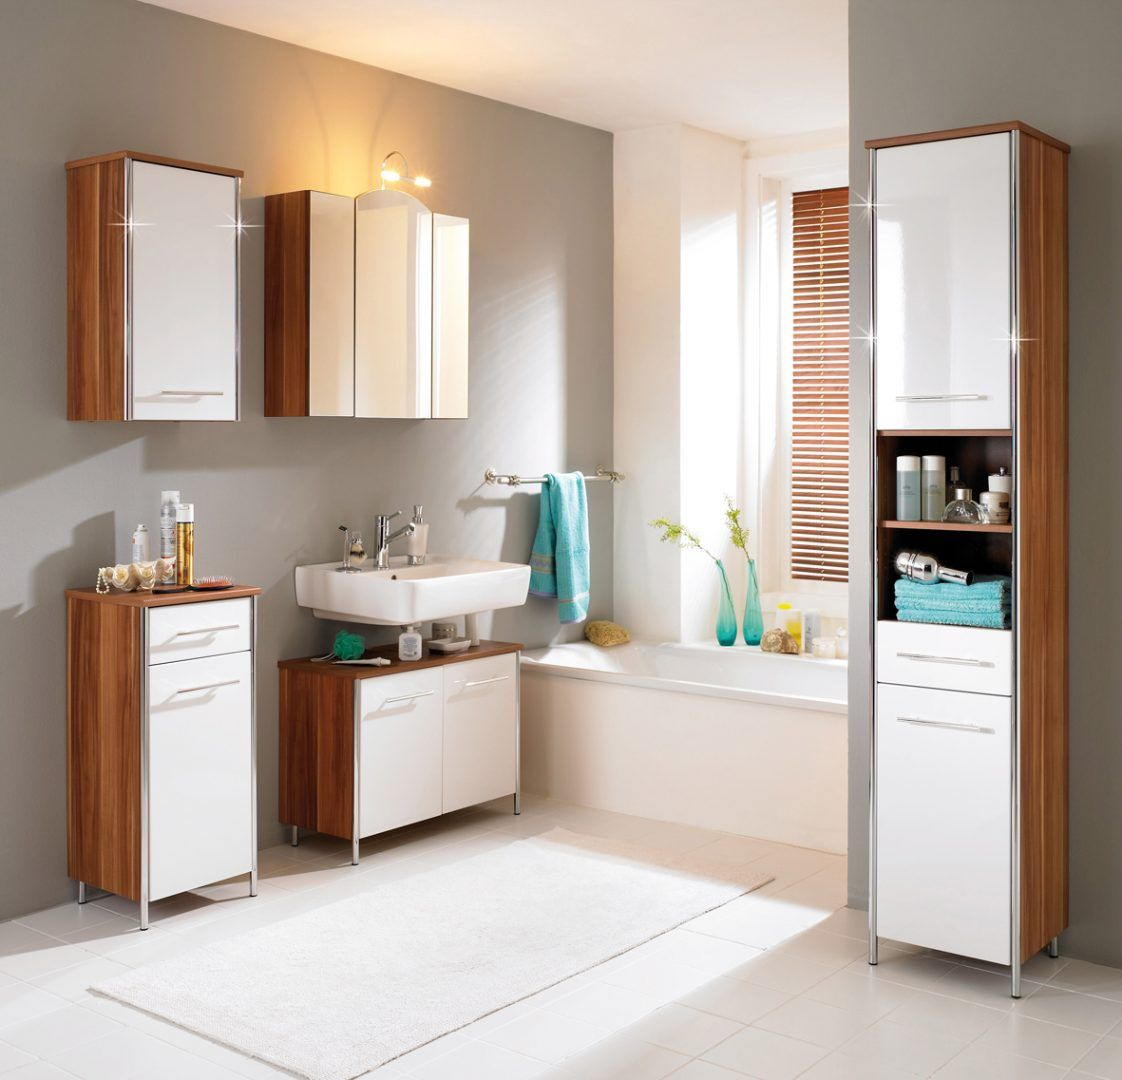 Lavabo Mueble Pequeño Muebles Para Lavabos | baño | Pinterest ...